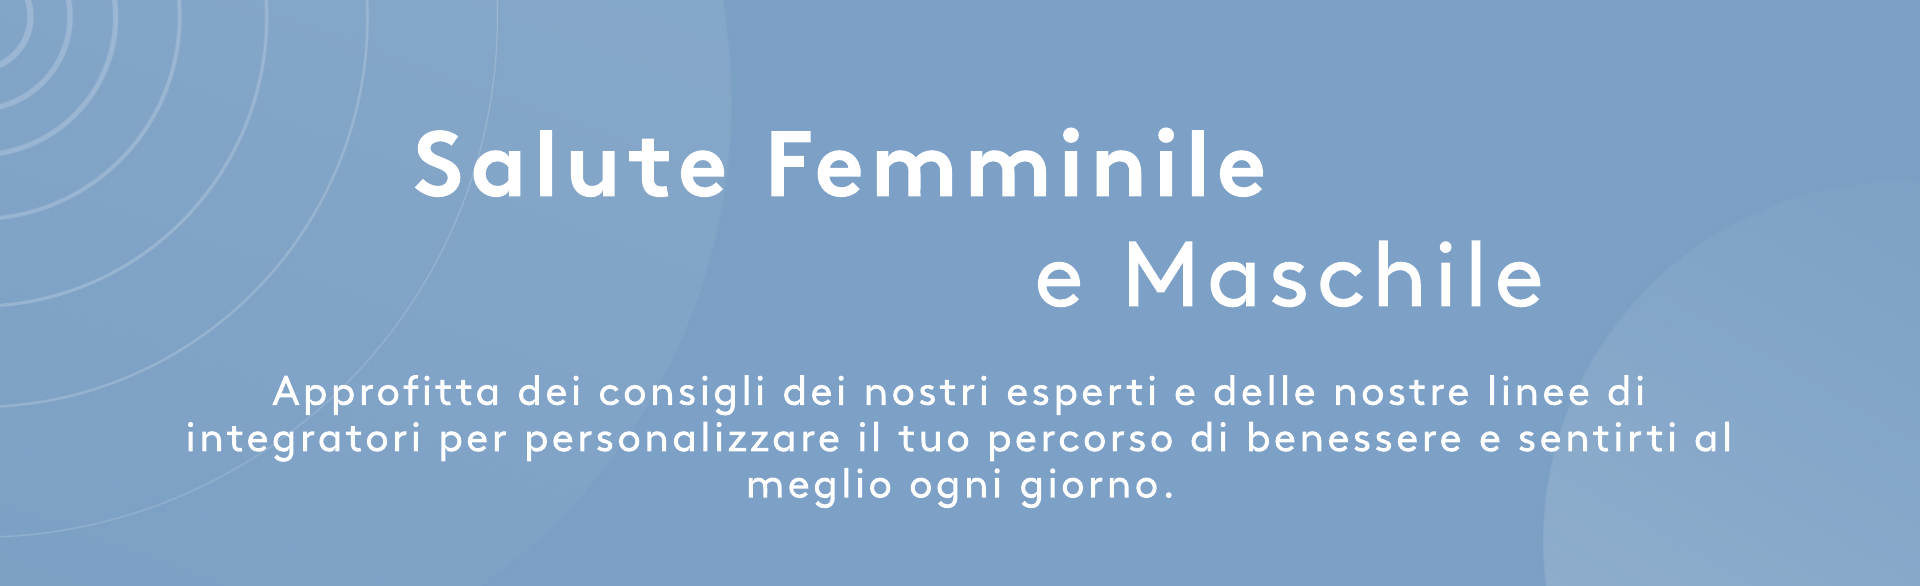 Salute Femminile e Maschile   Myvitamins